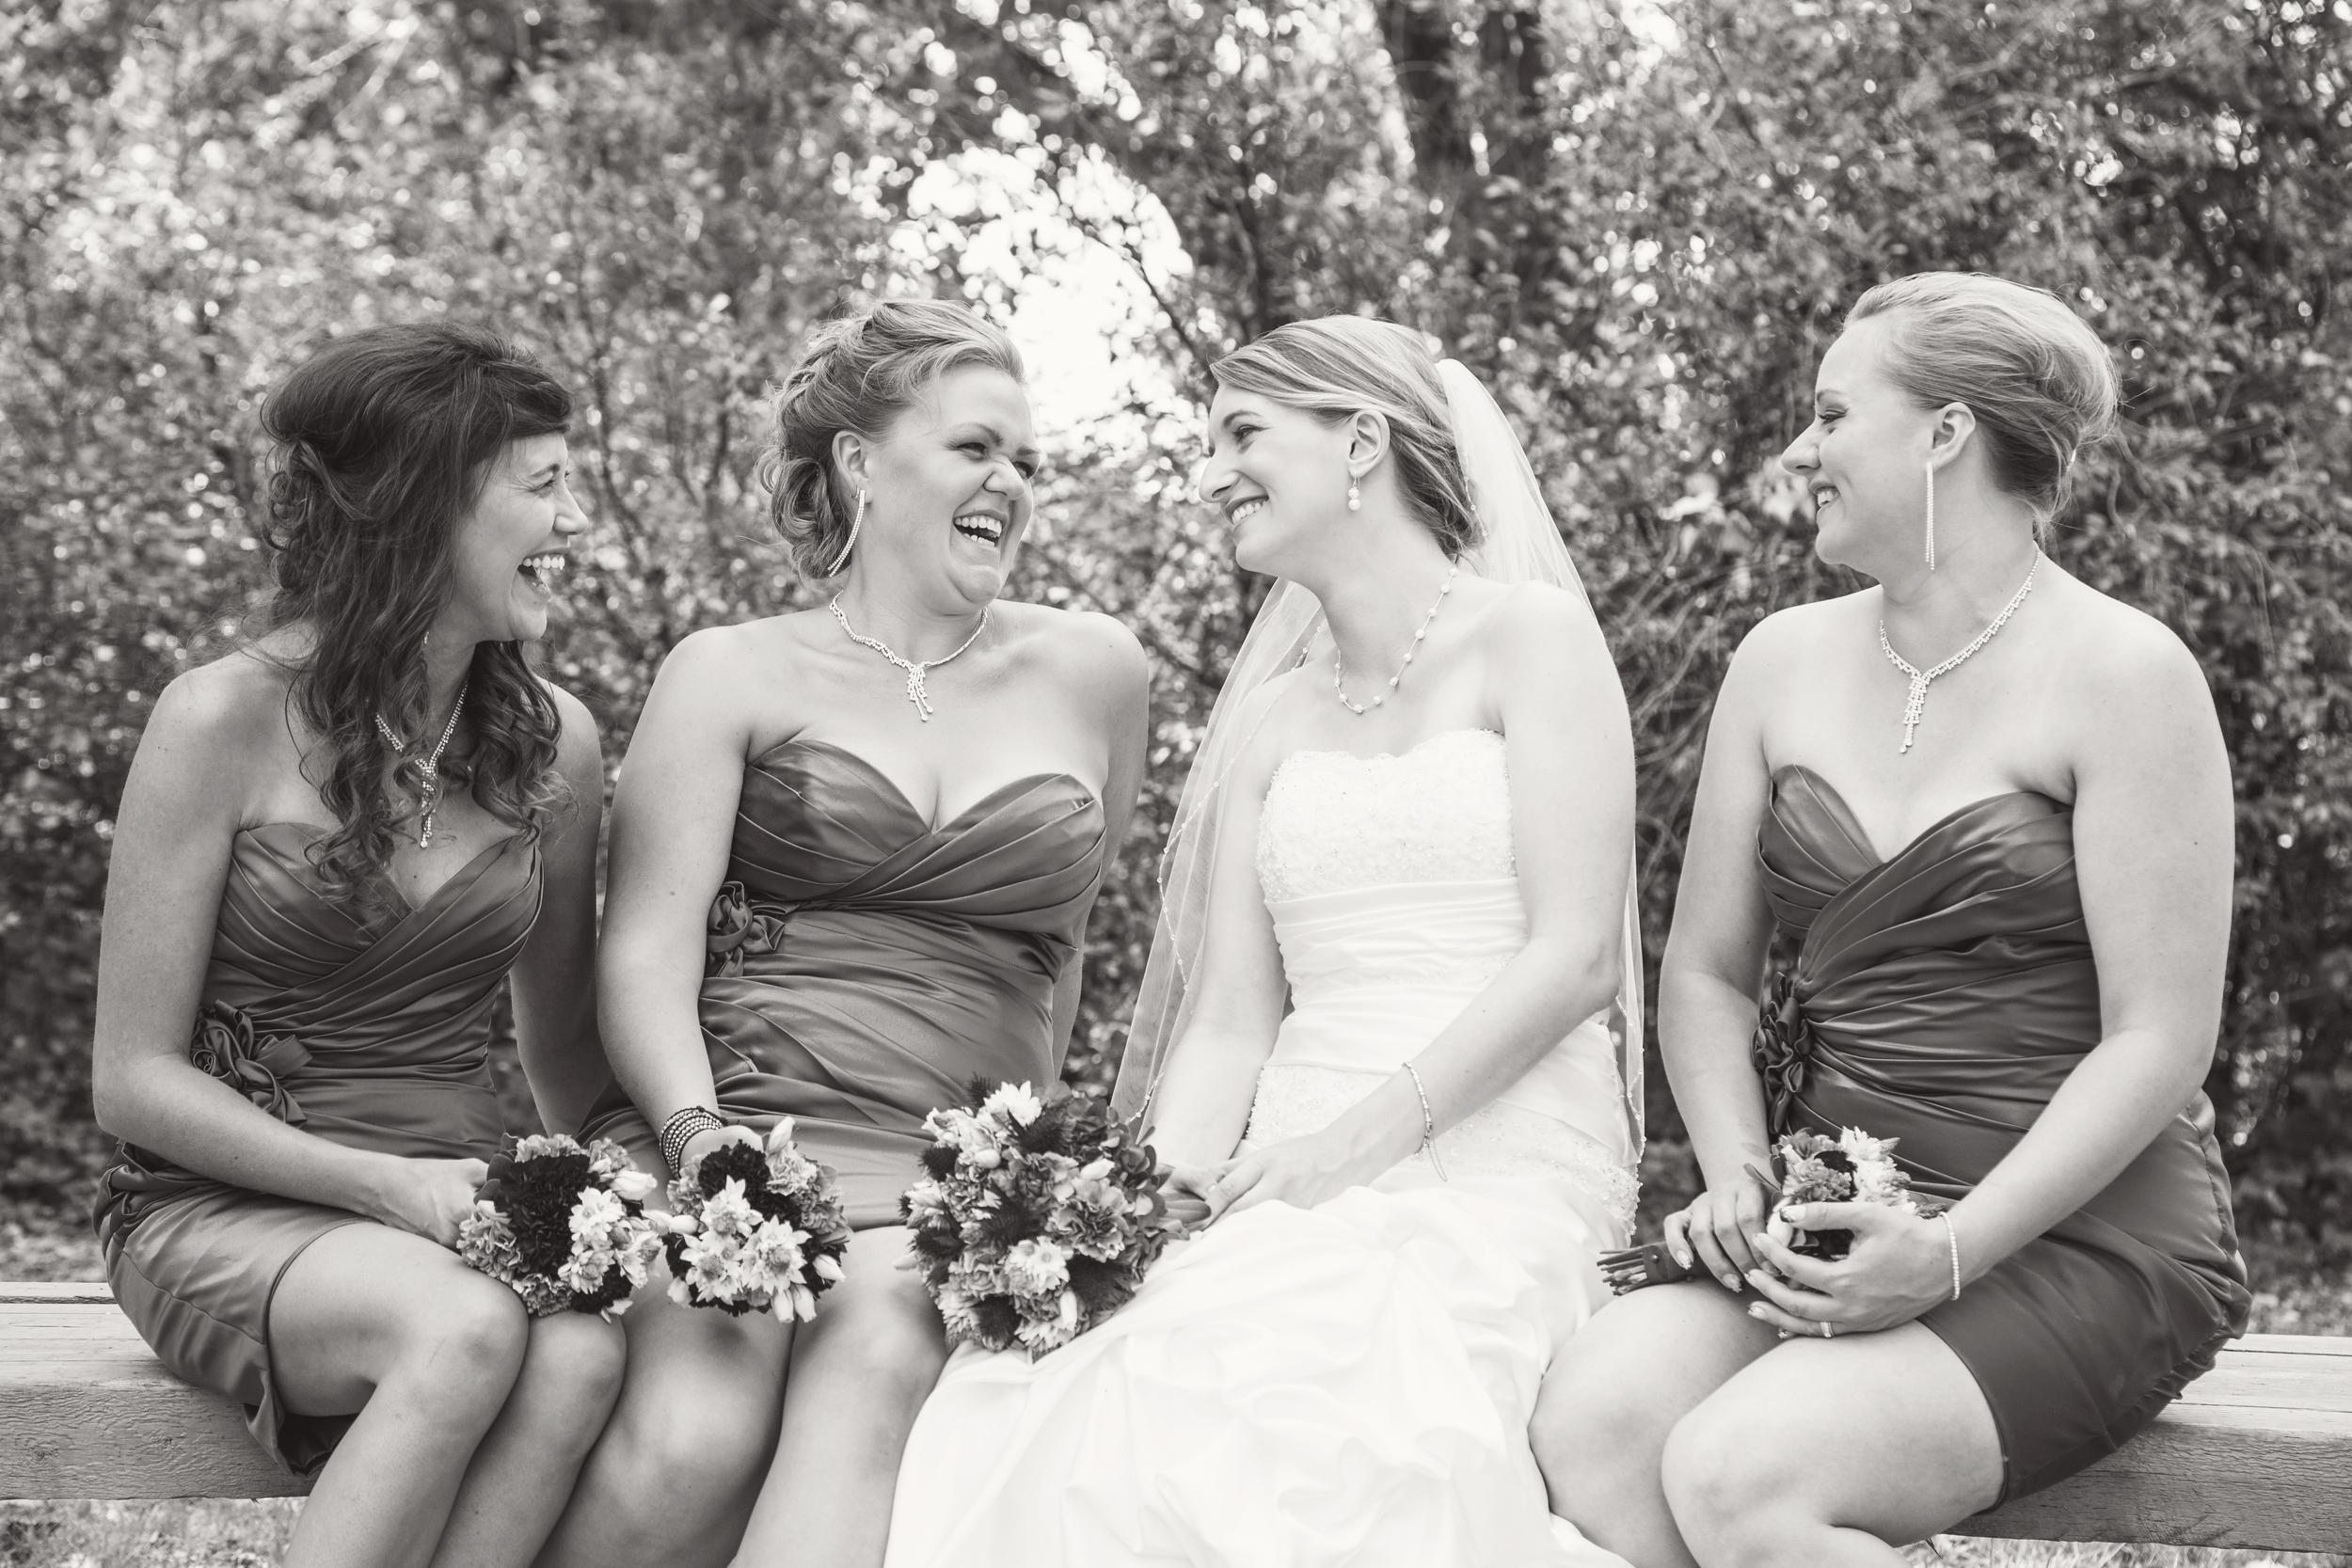 KB_wedding_427_bw.jpg